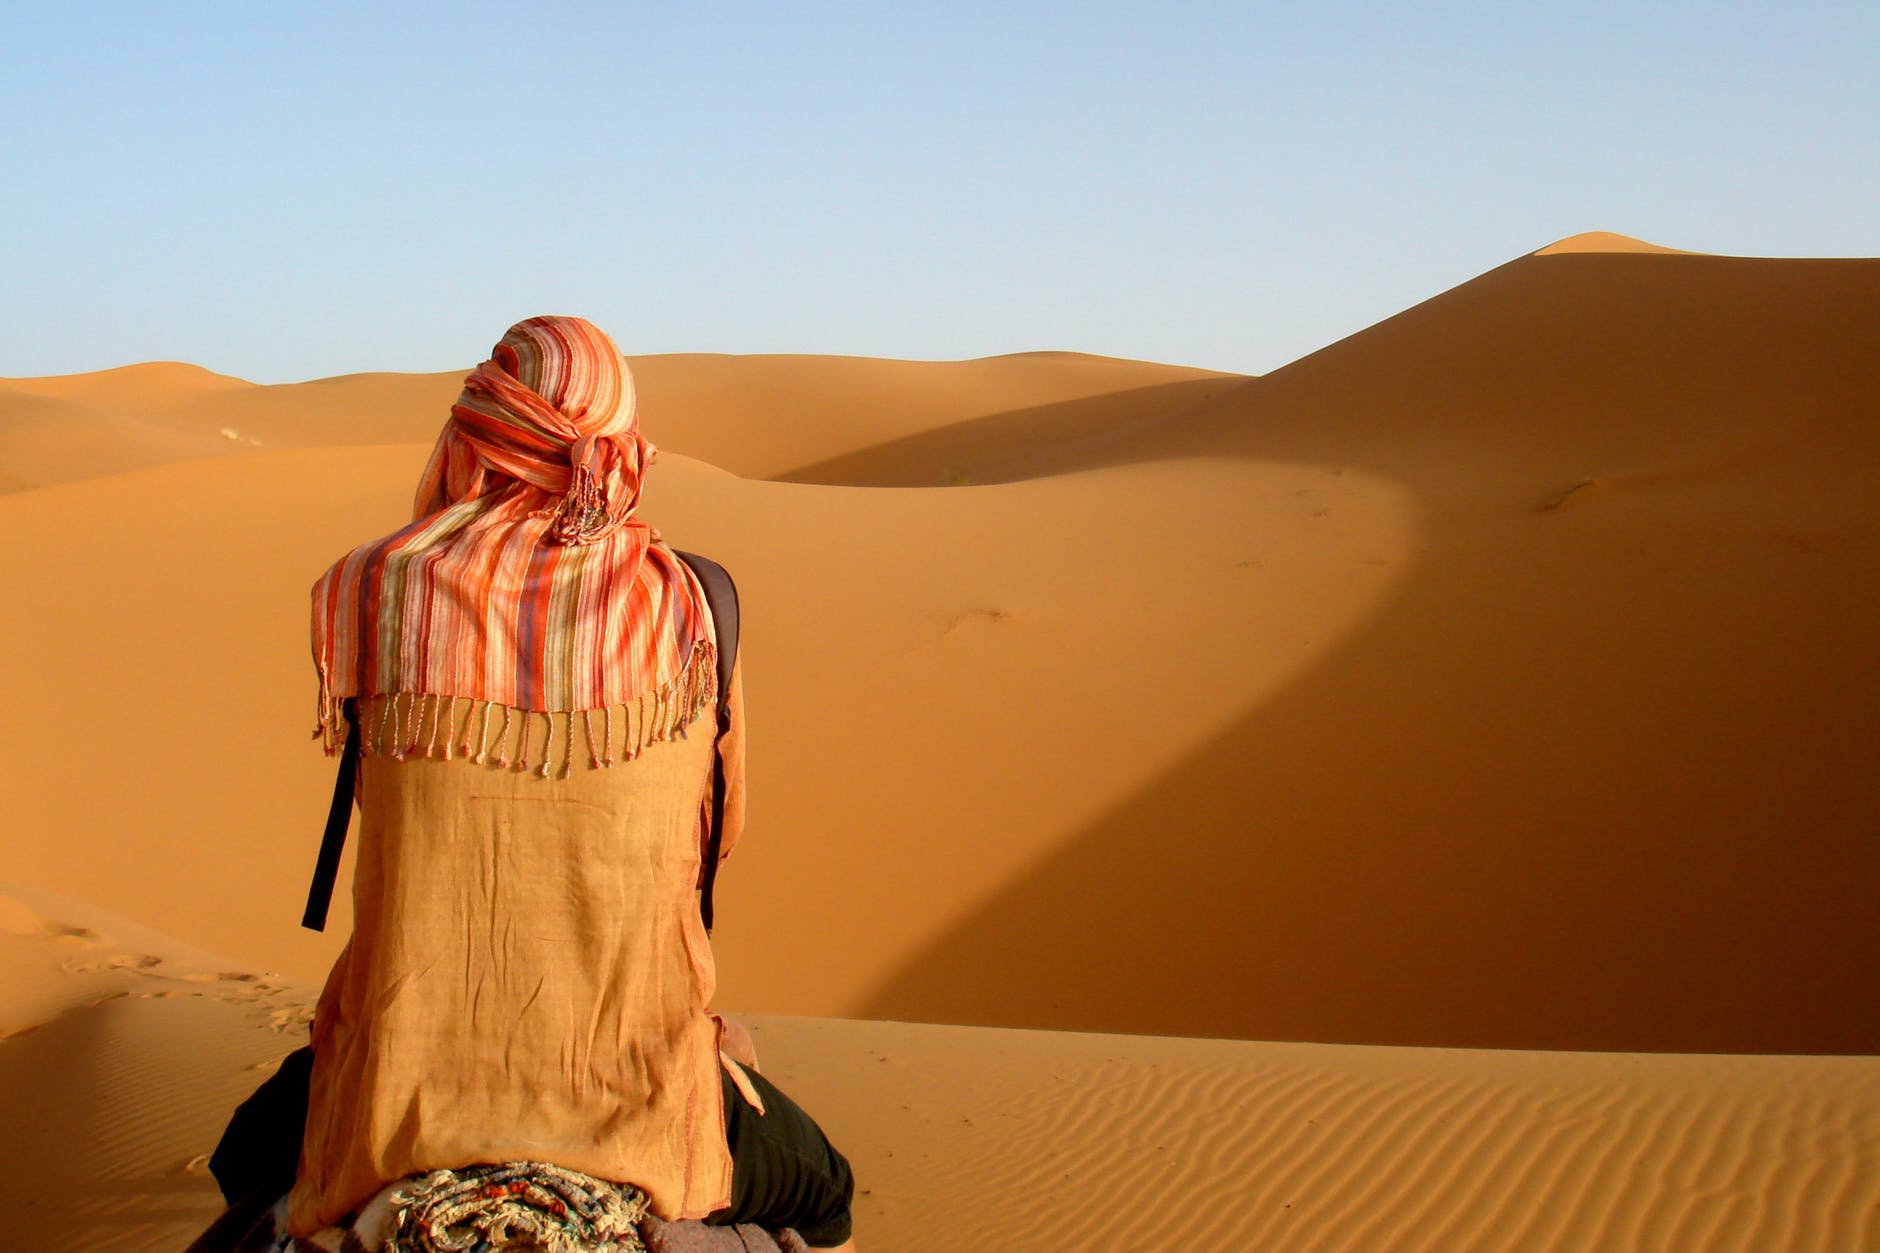 Ouled Yaaakoub, Morocco